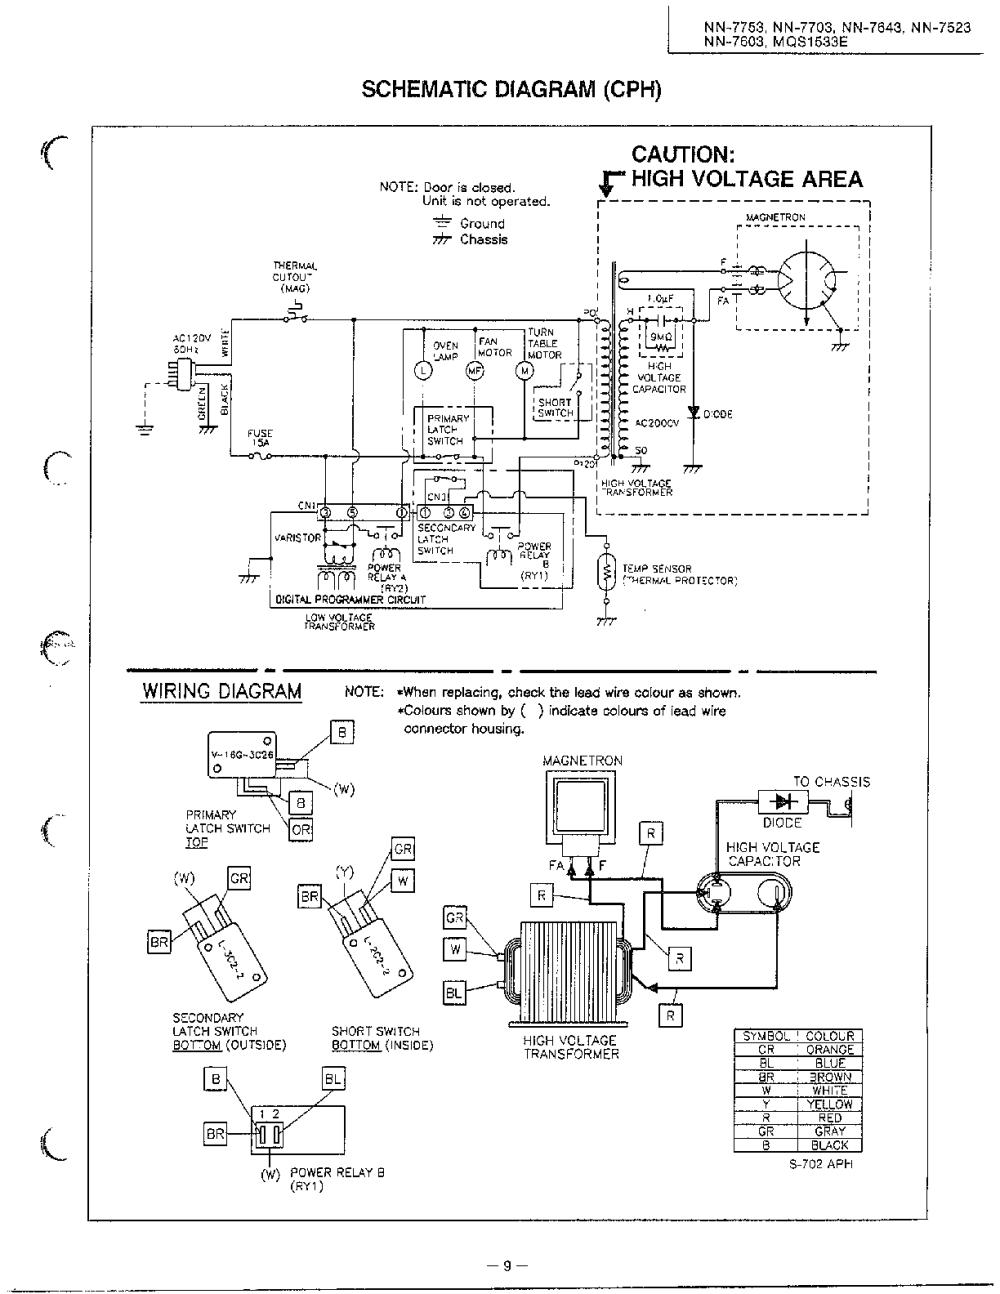 medium resolution of panasonic panasonic microwave oven parts model nn 7753 sears panasonic microwave oven schematic diagram